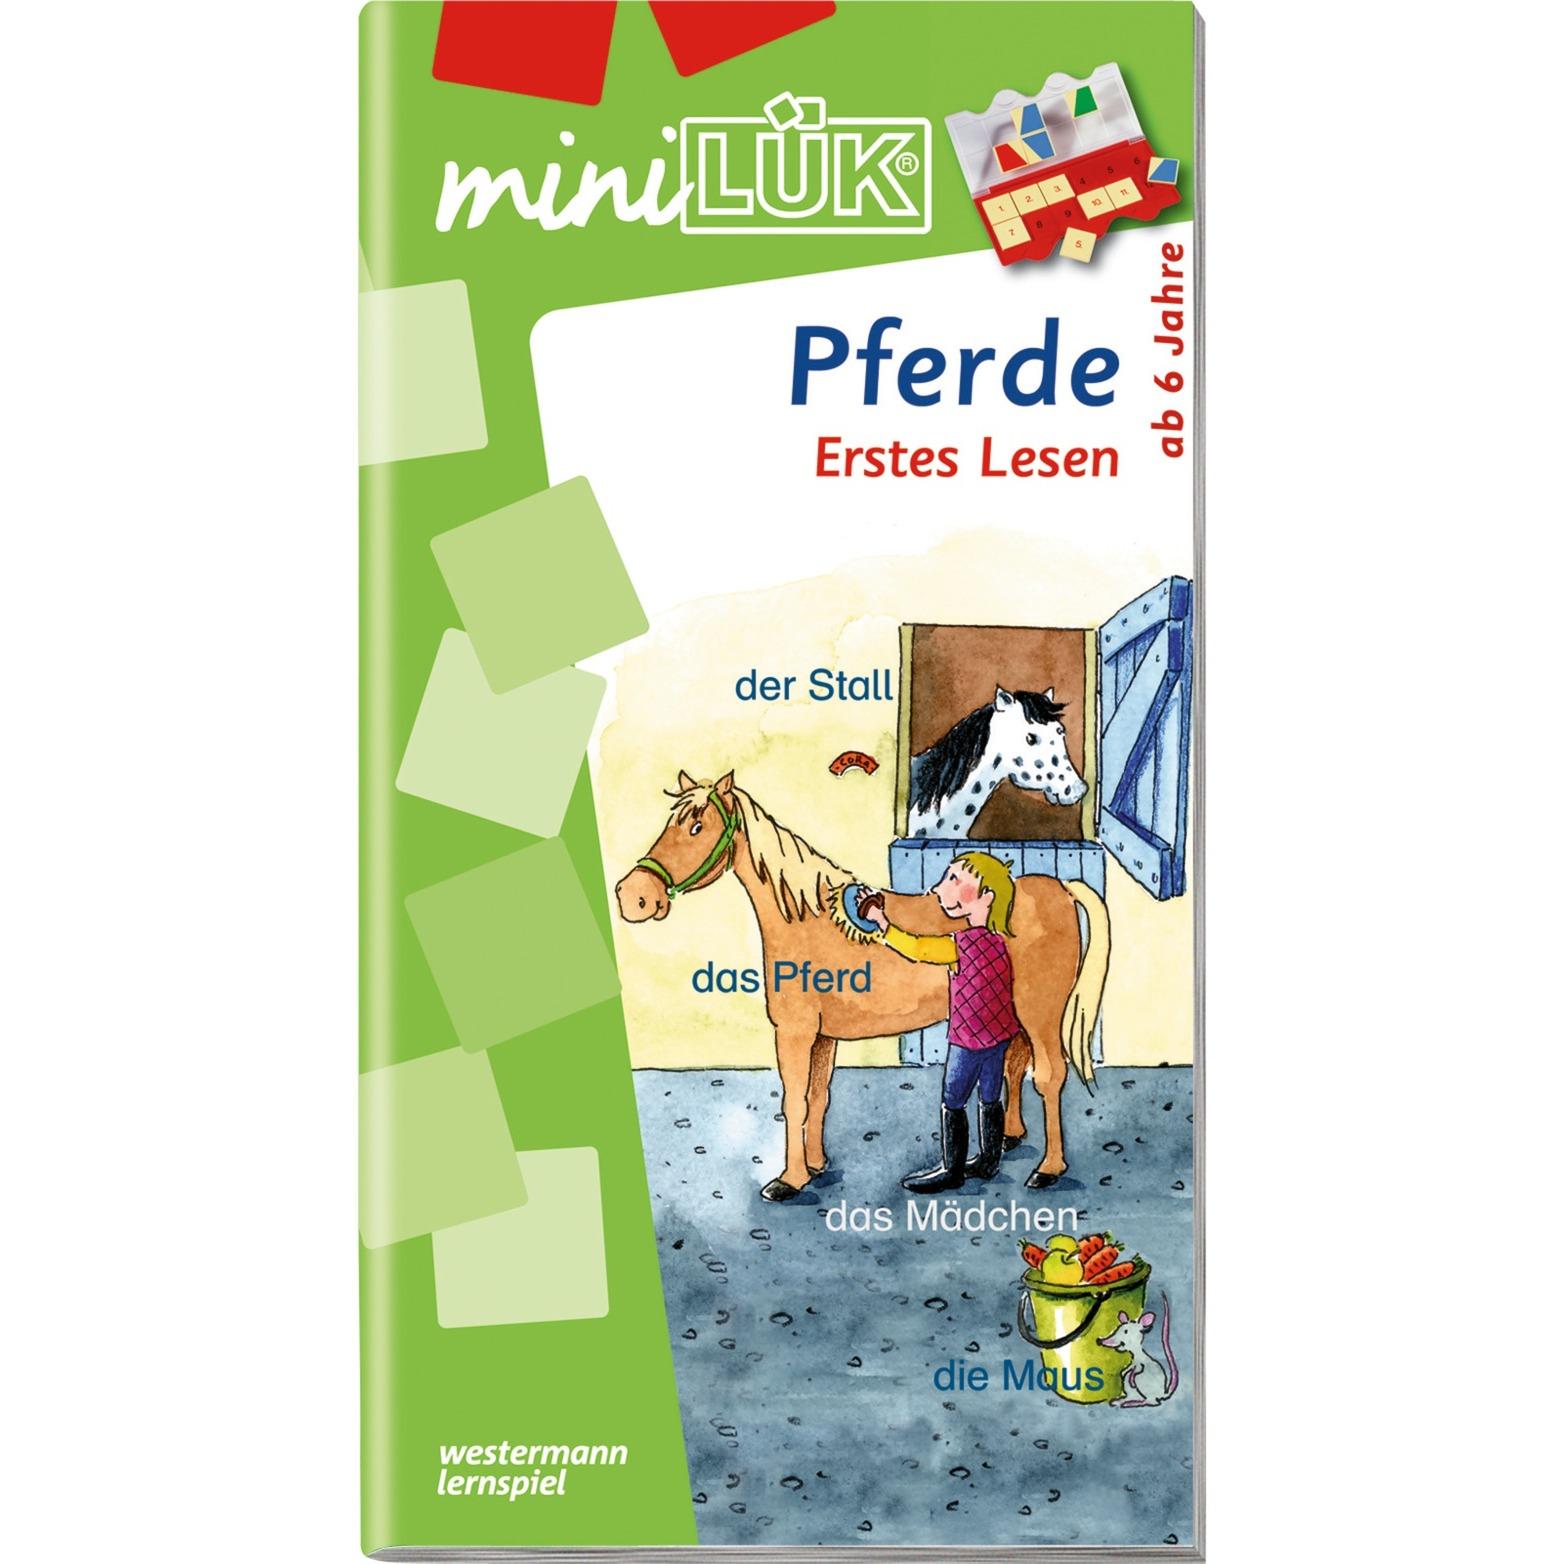 miniLÜK Pferde Erstes Lesen Elementares Lernen für Kinder ab 6 Jahren livre pour enfants, Manuel